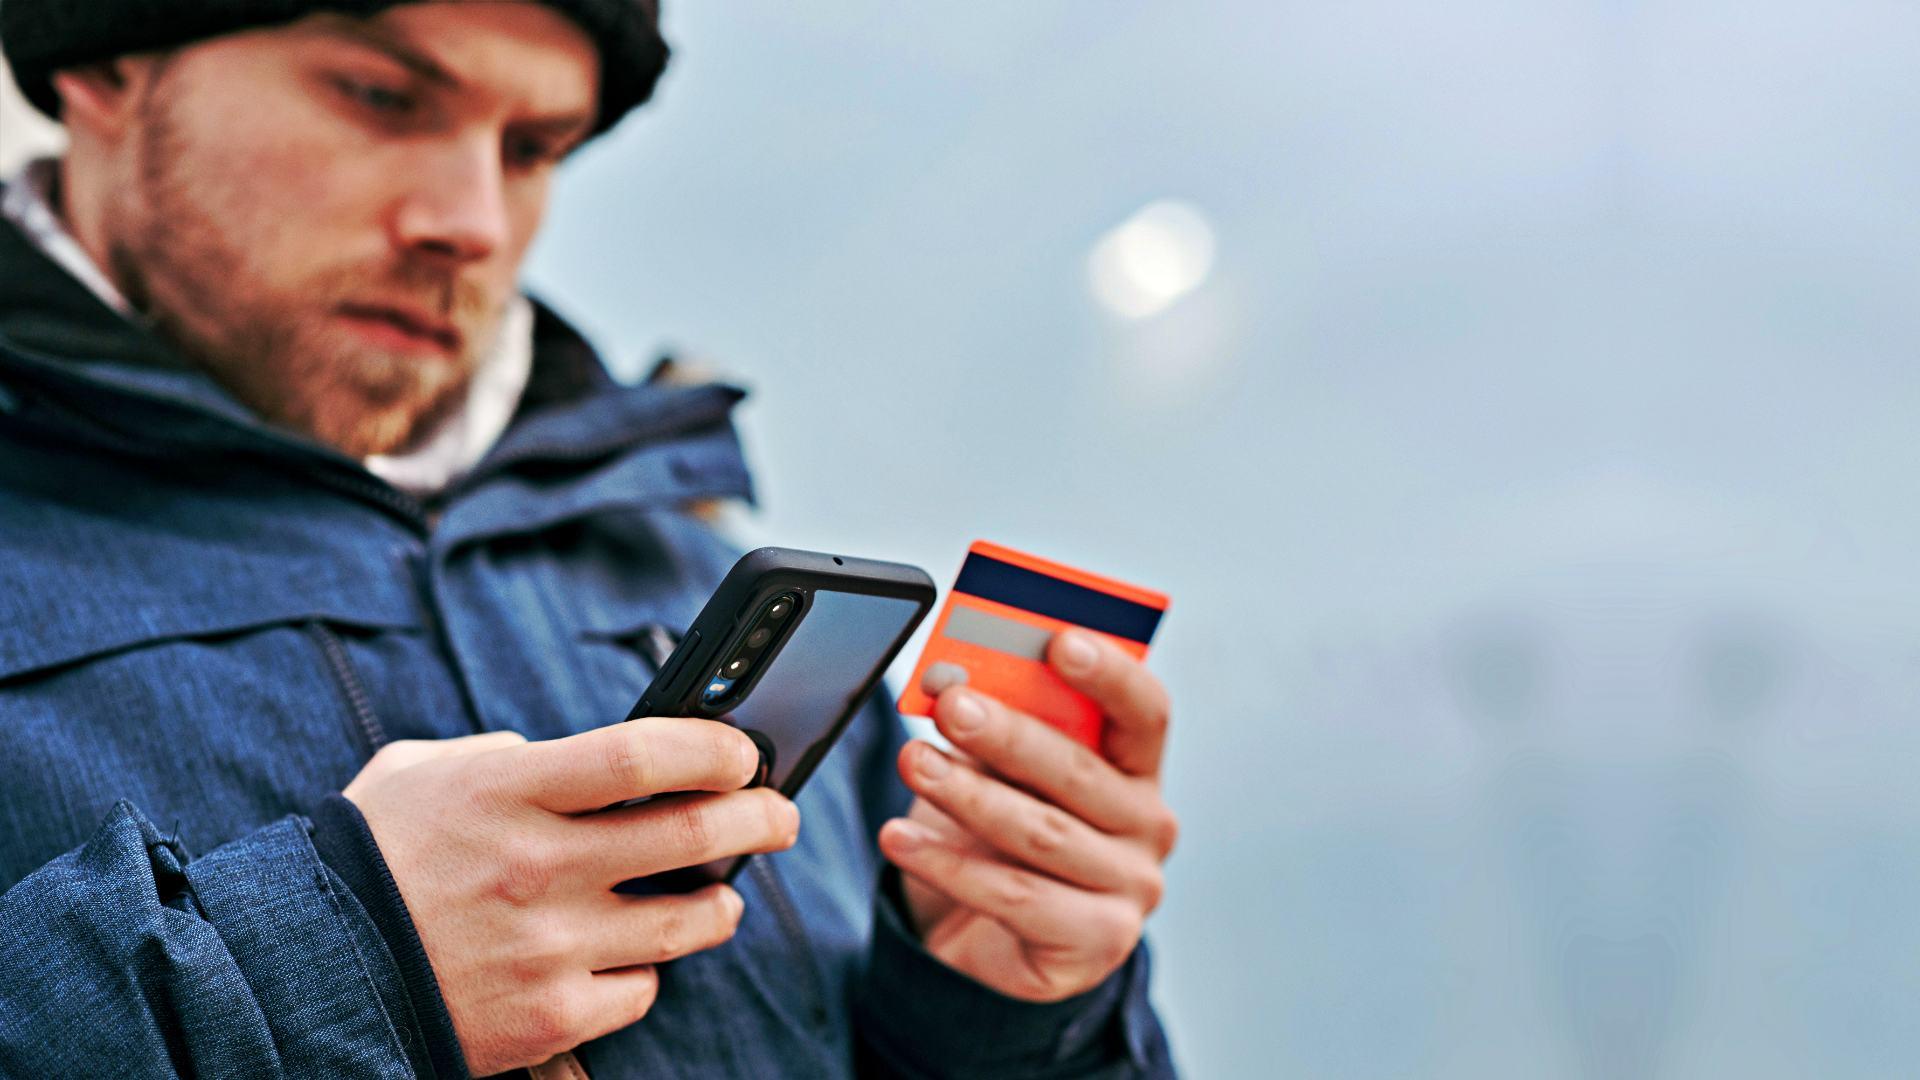 elektronikus fizetesi szokasok MNB penzforgalom